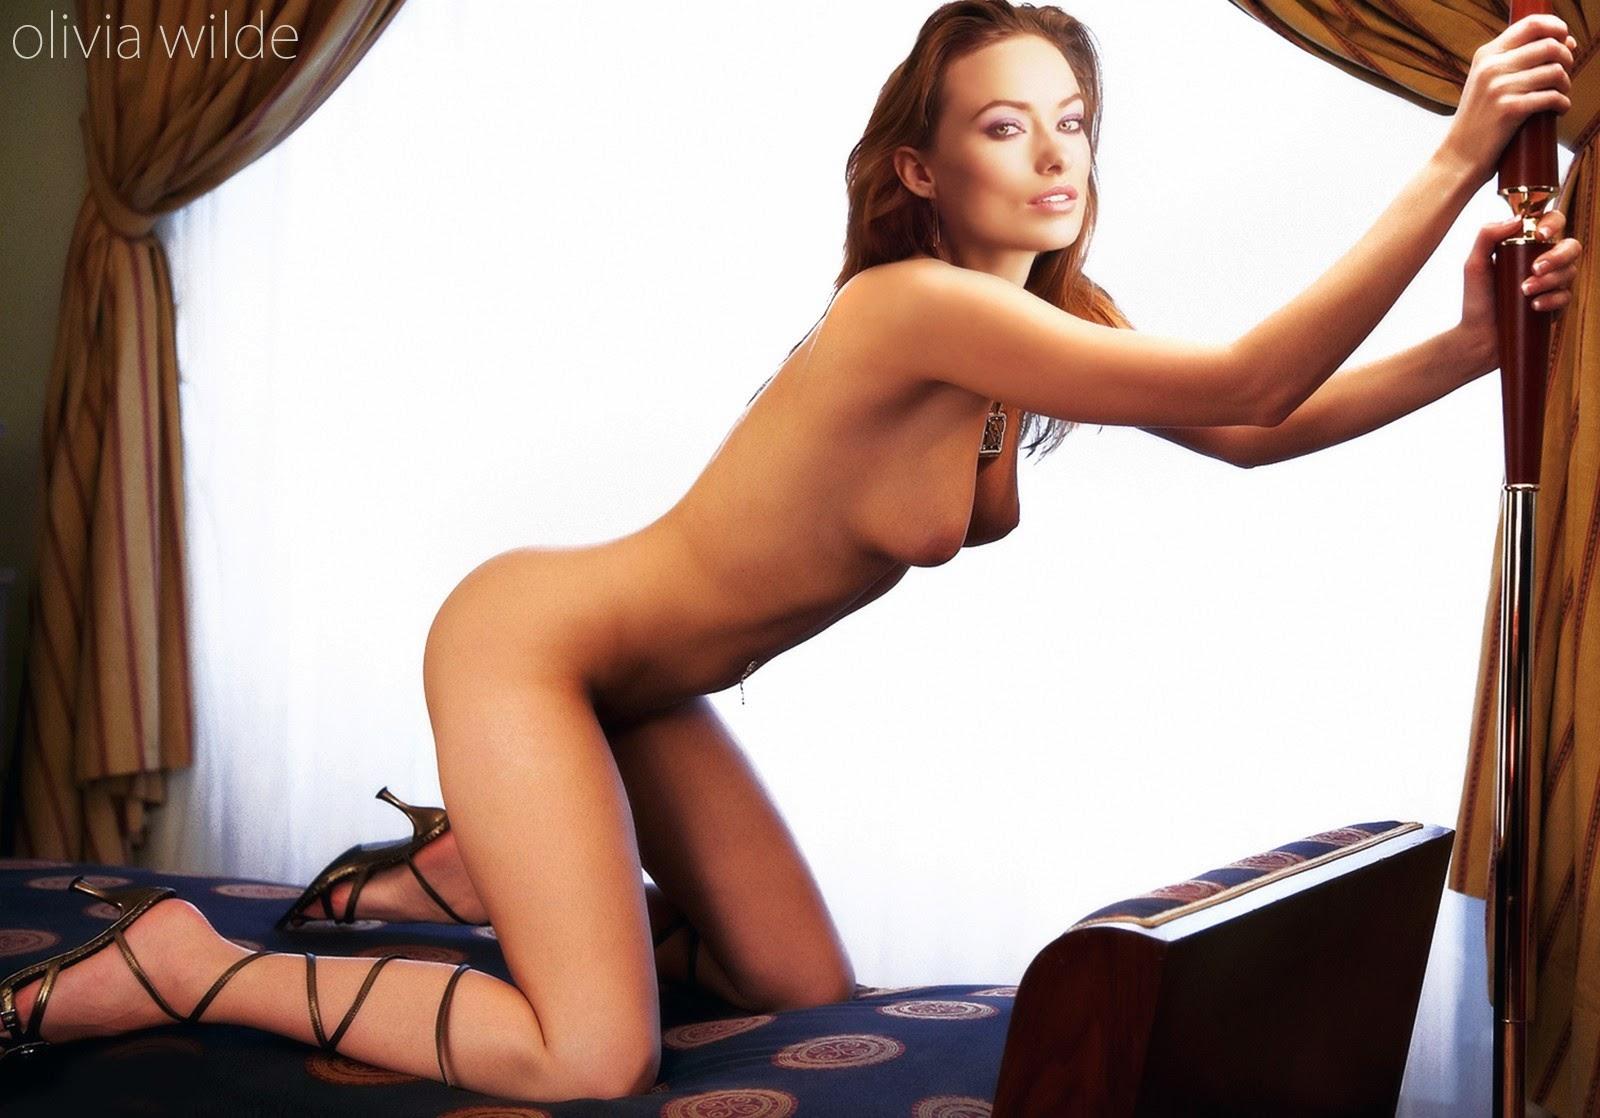 Olivia wilde nude breasts 5